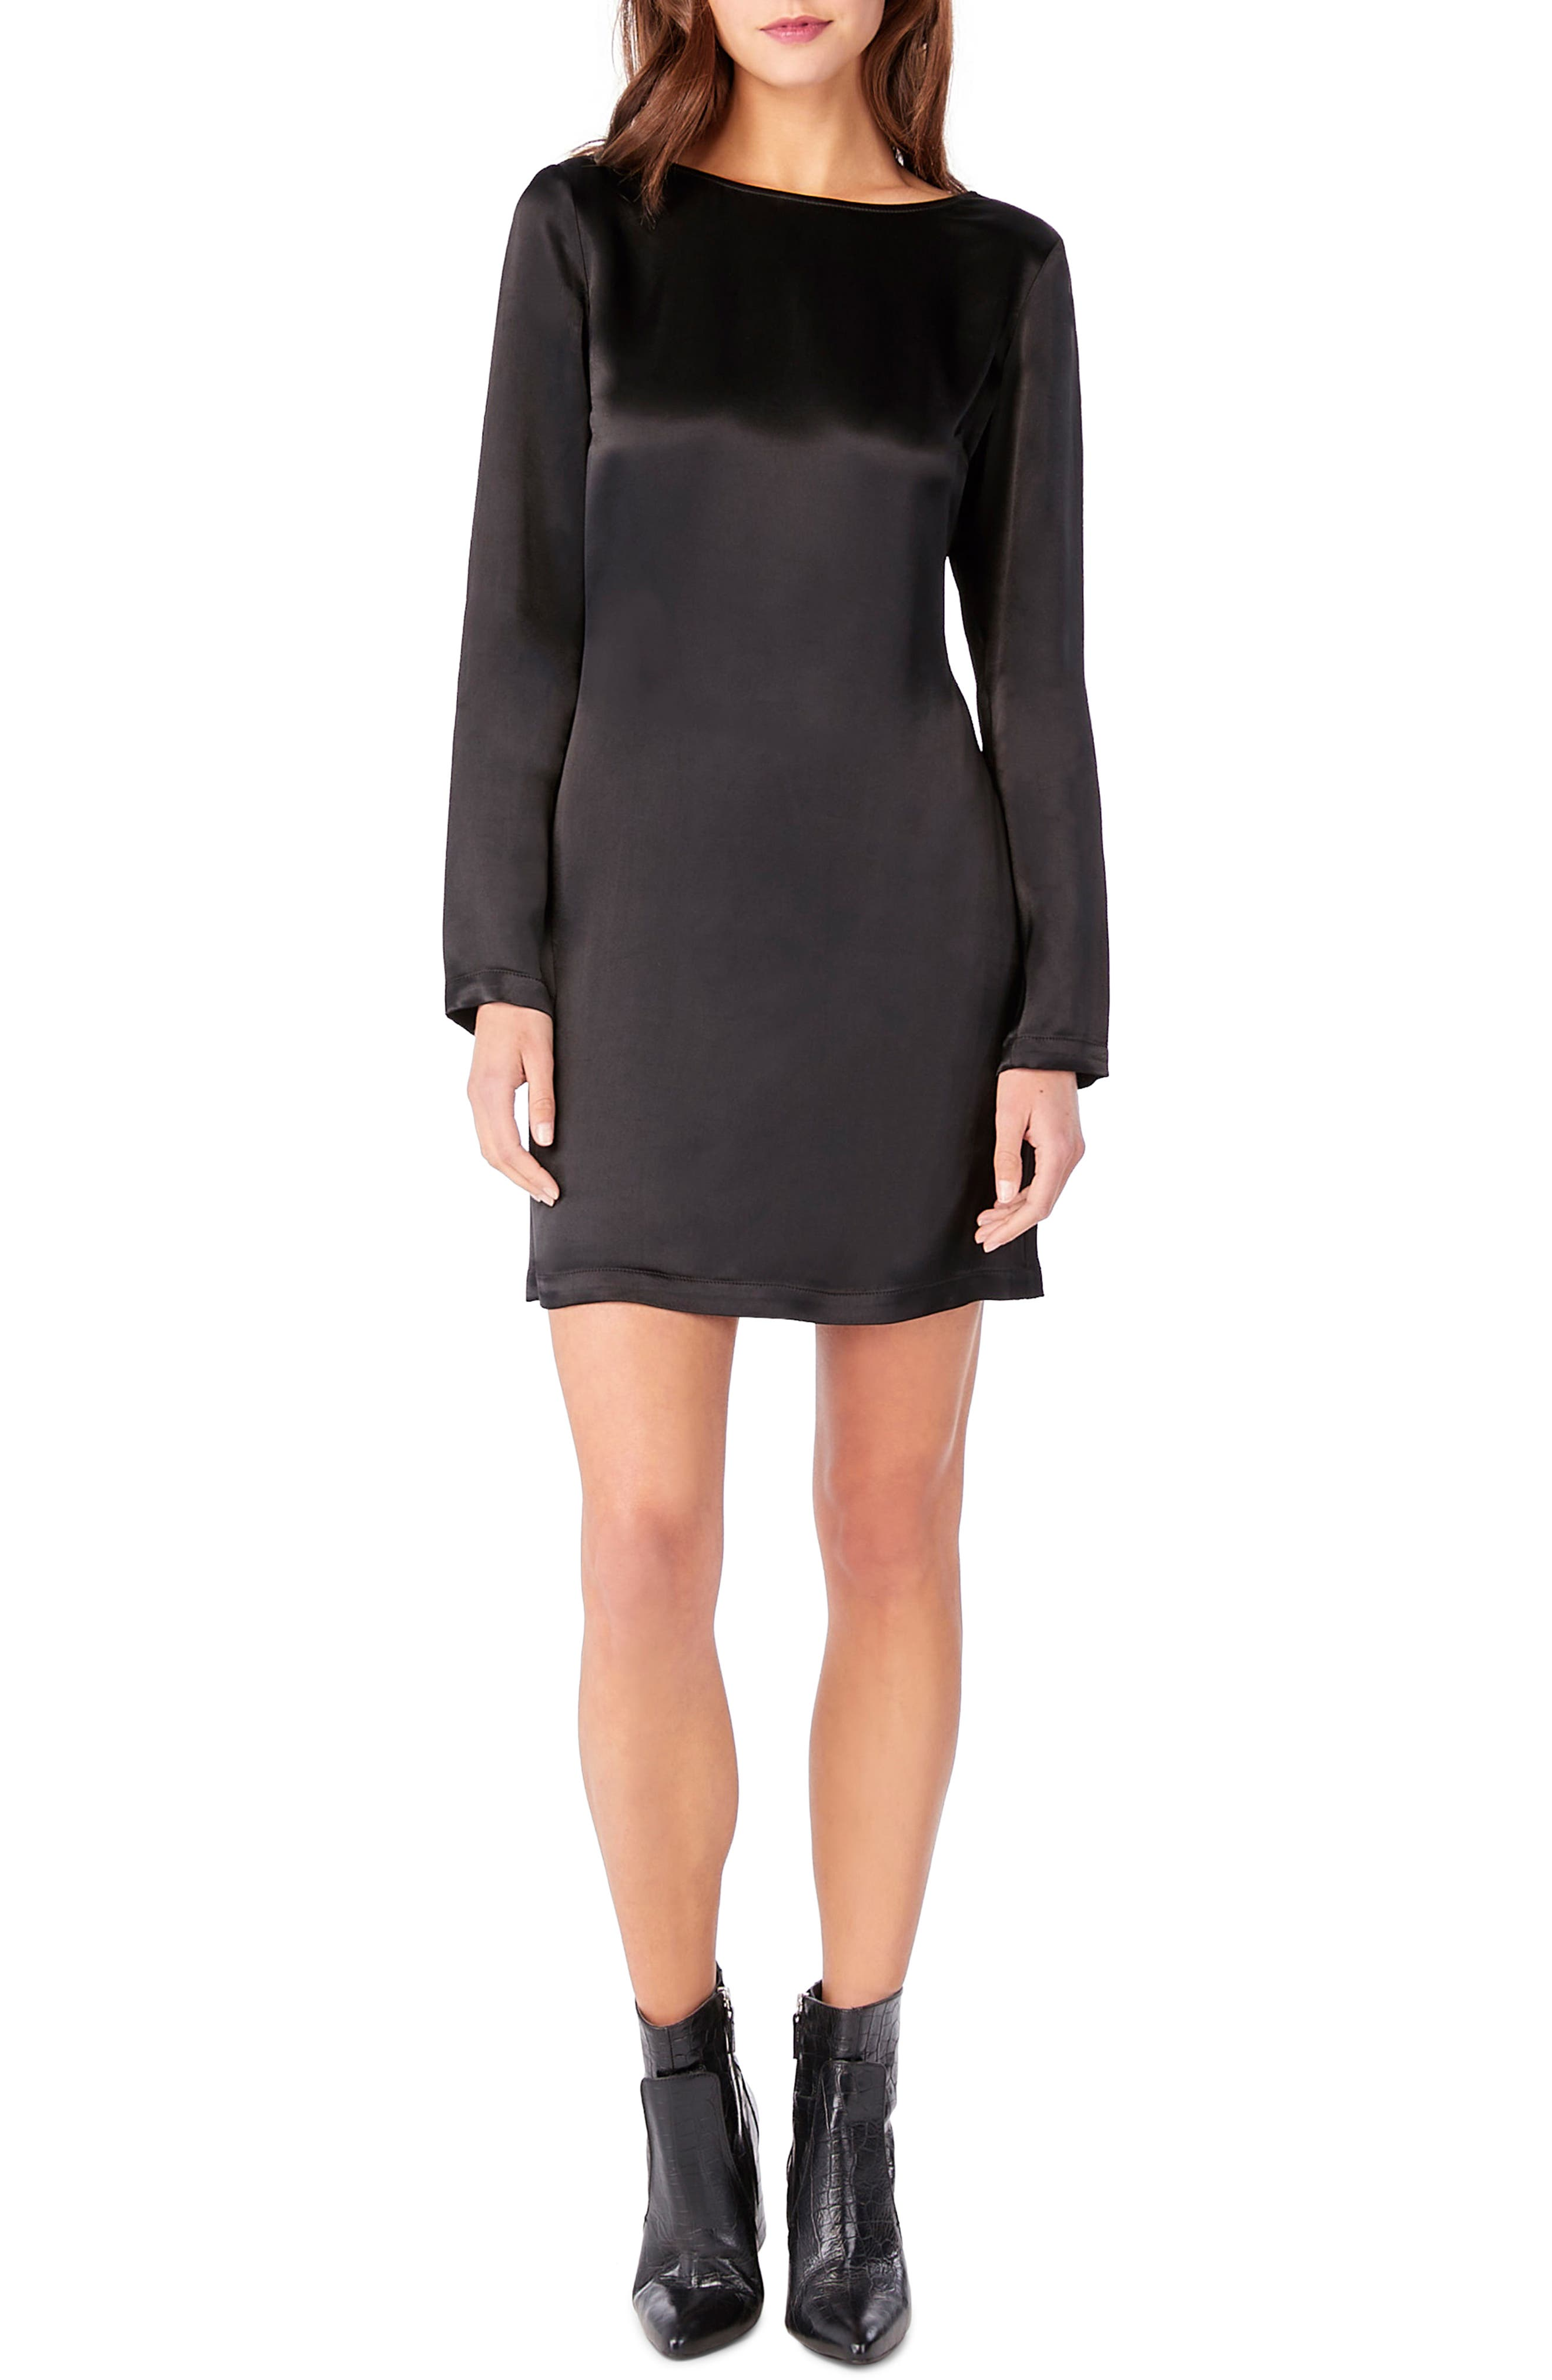 Alternate Image 1 Selected - Michael Stars Lace Inset Surplice Back Shift Dress